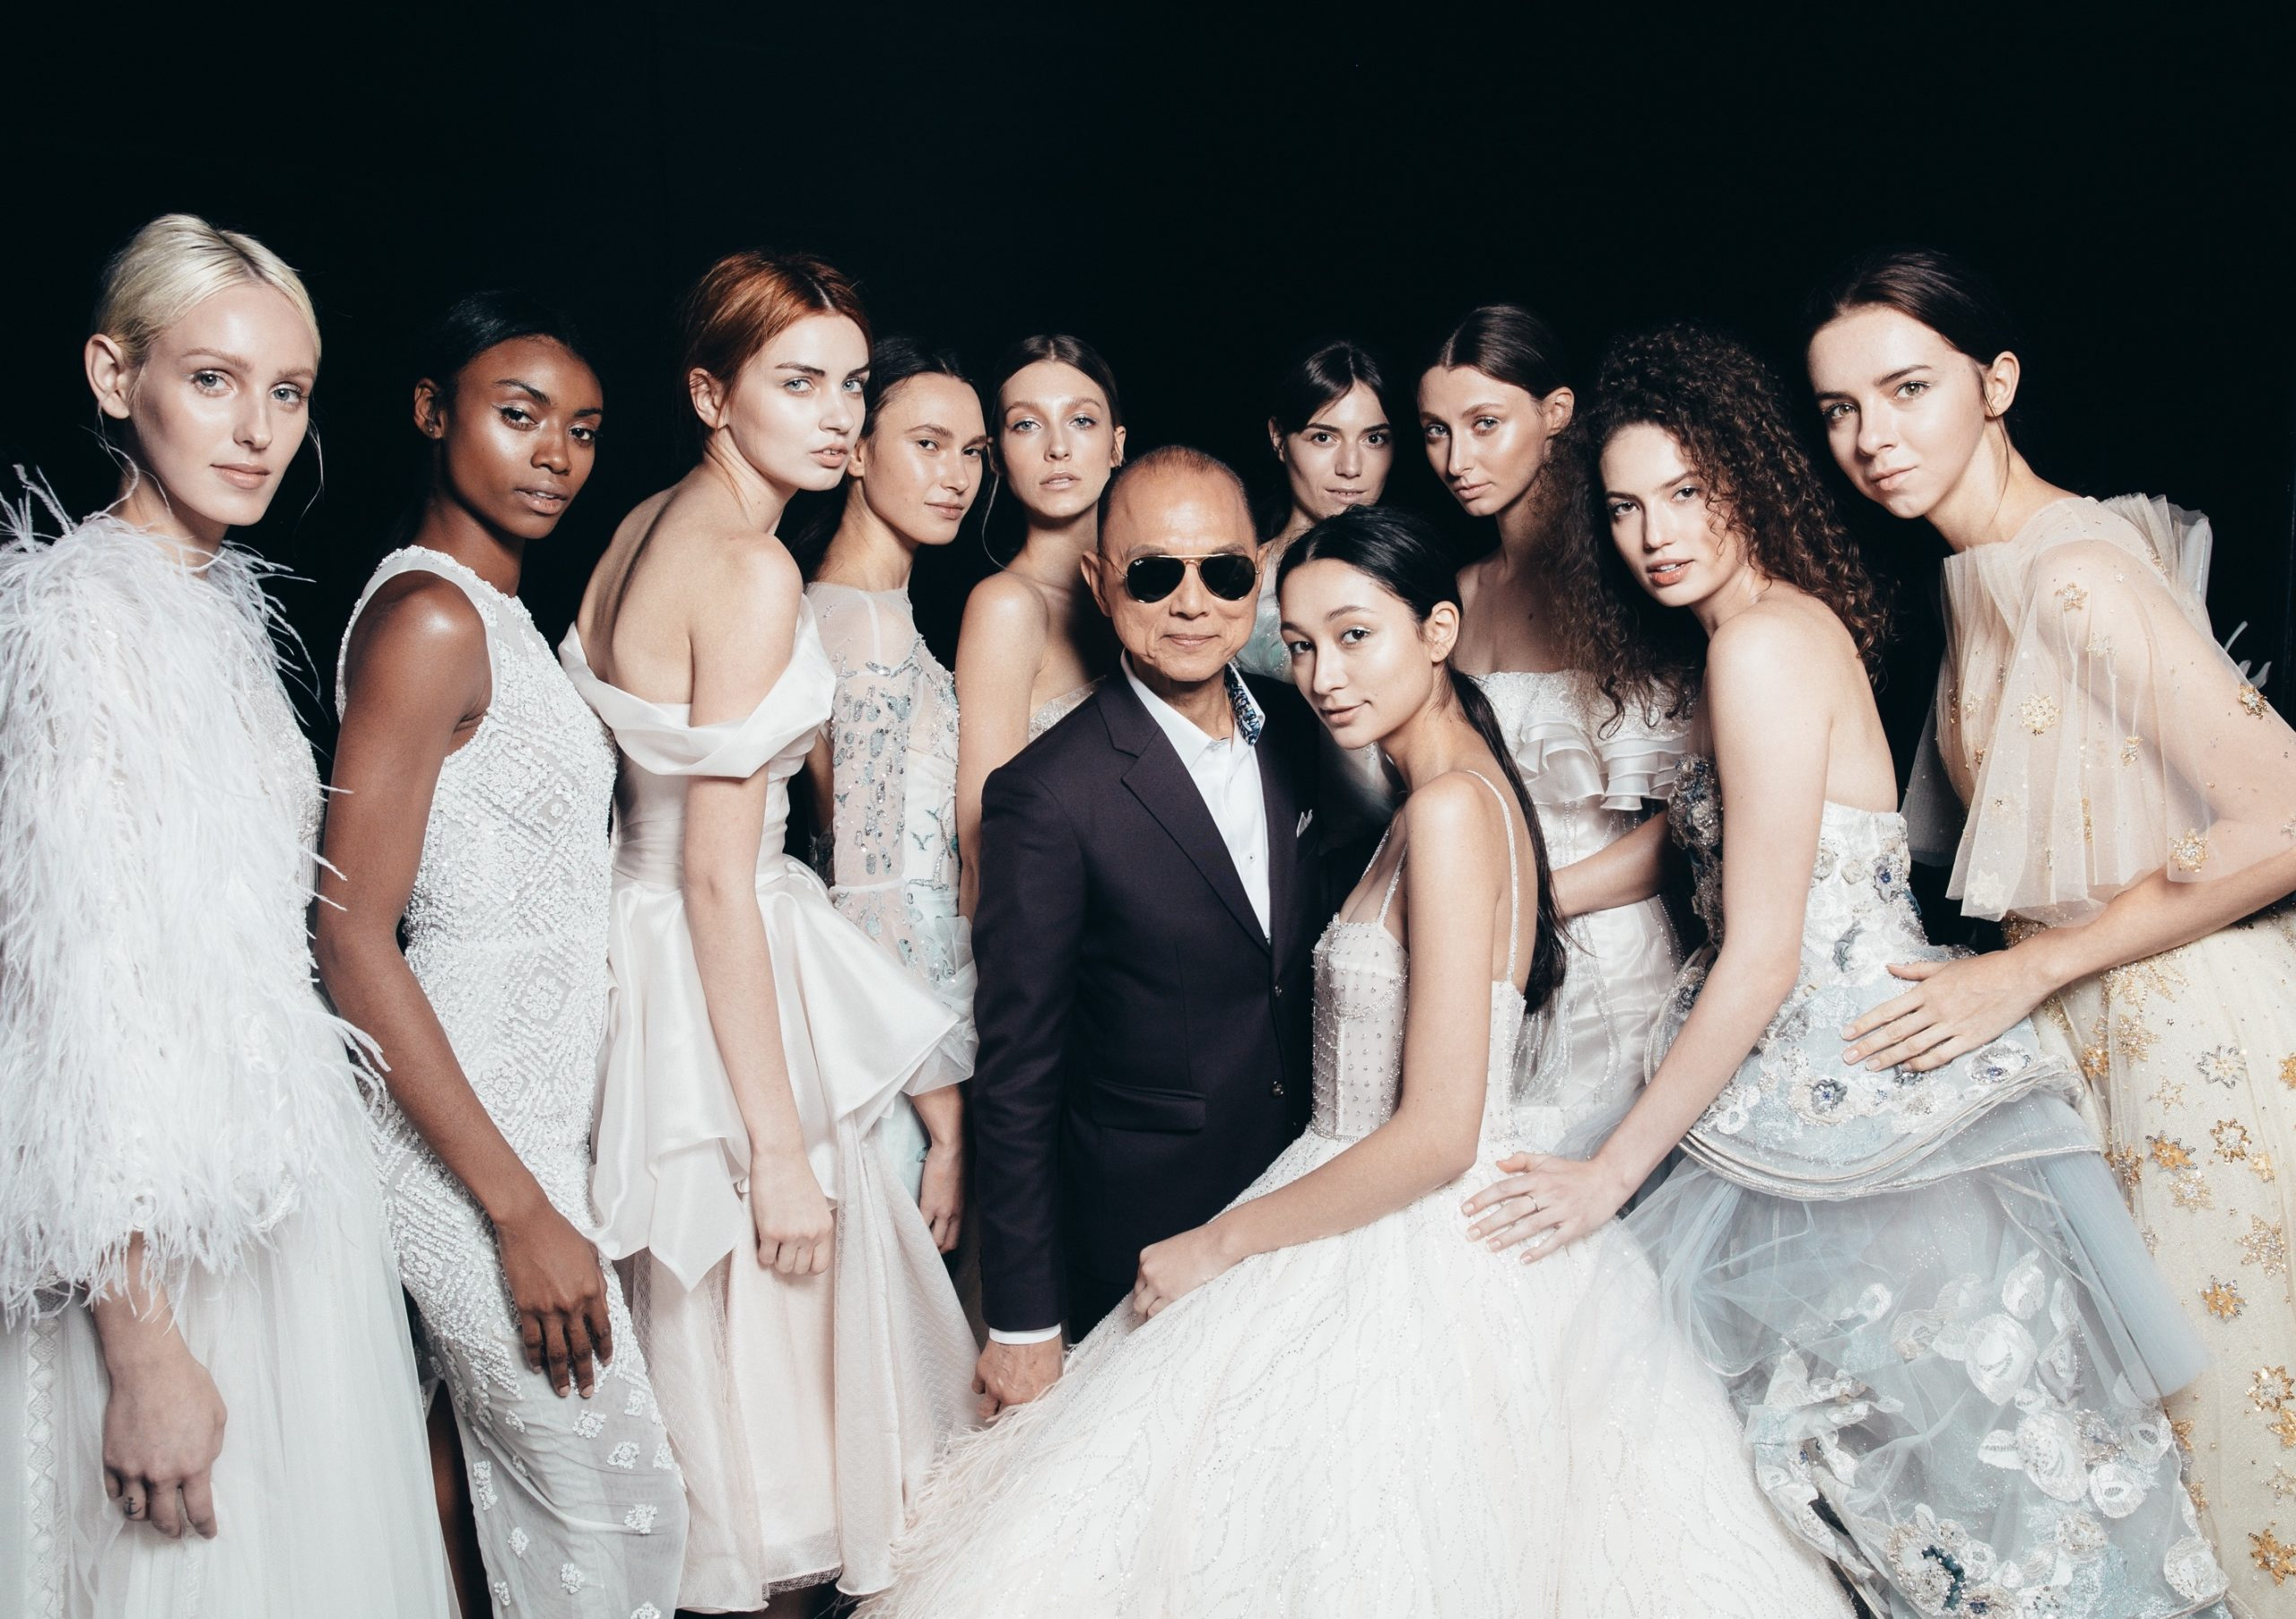 Jimmy Choo: Cinderella Tale?